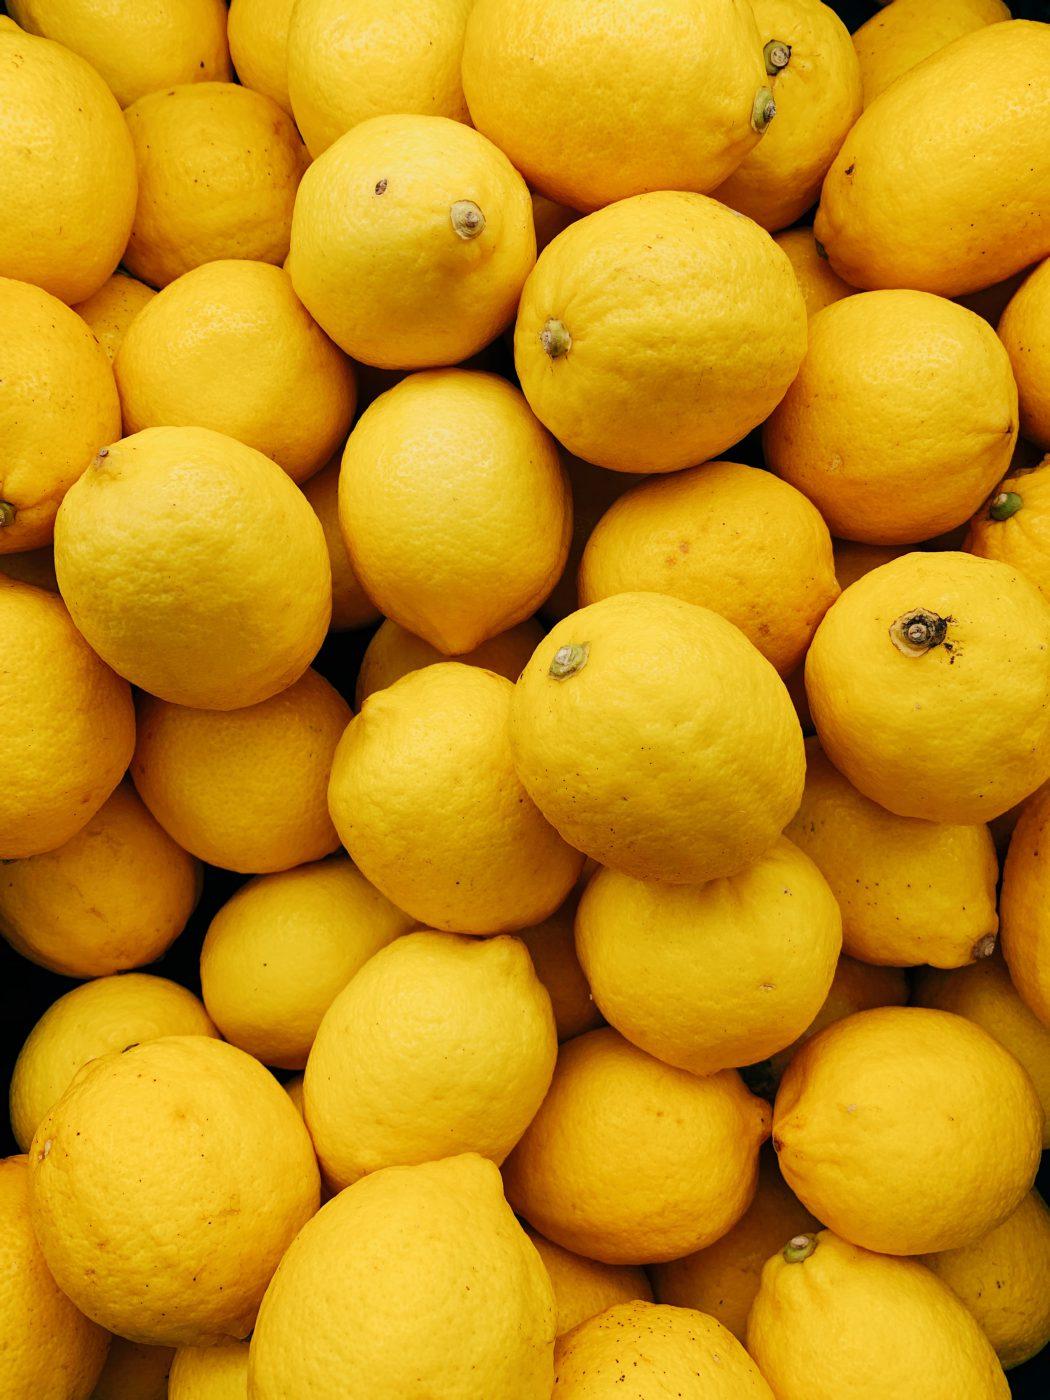 Italian digestivo limoncello